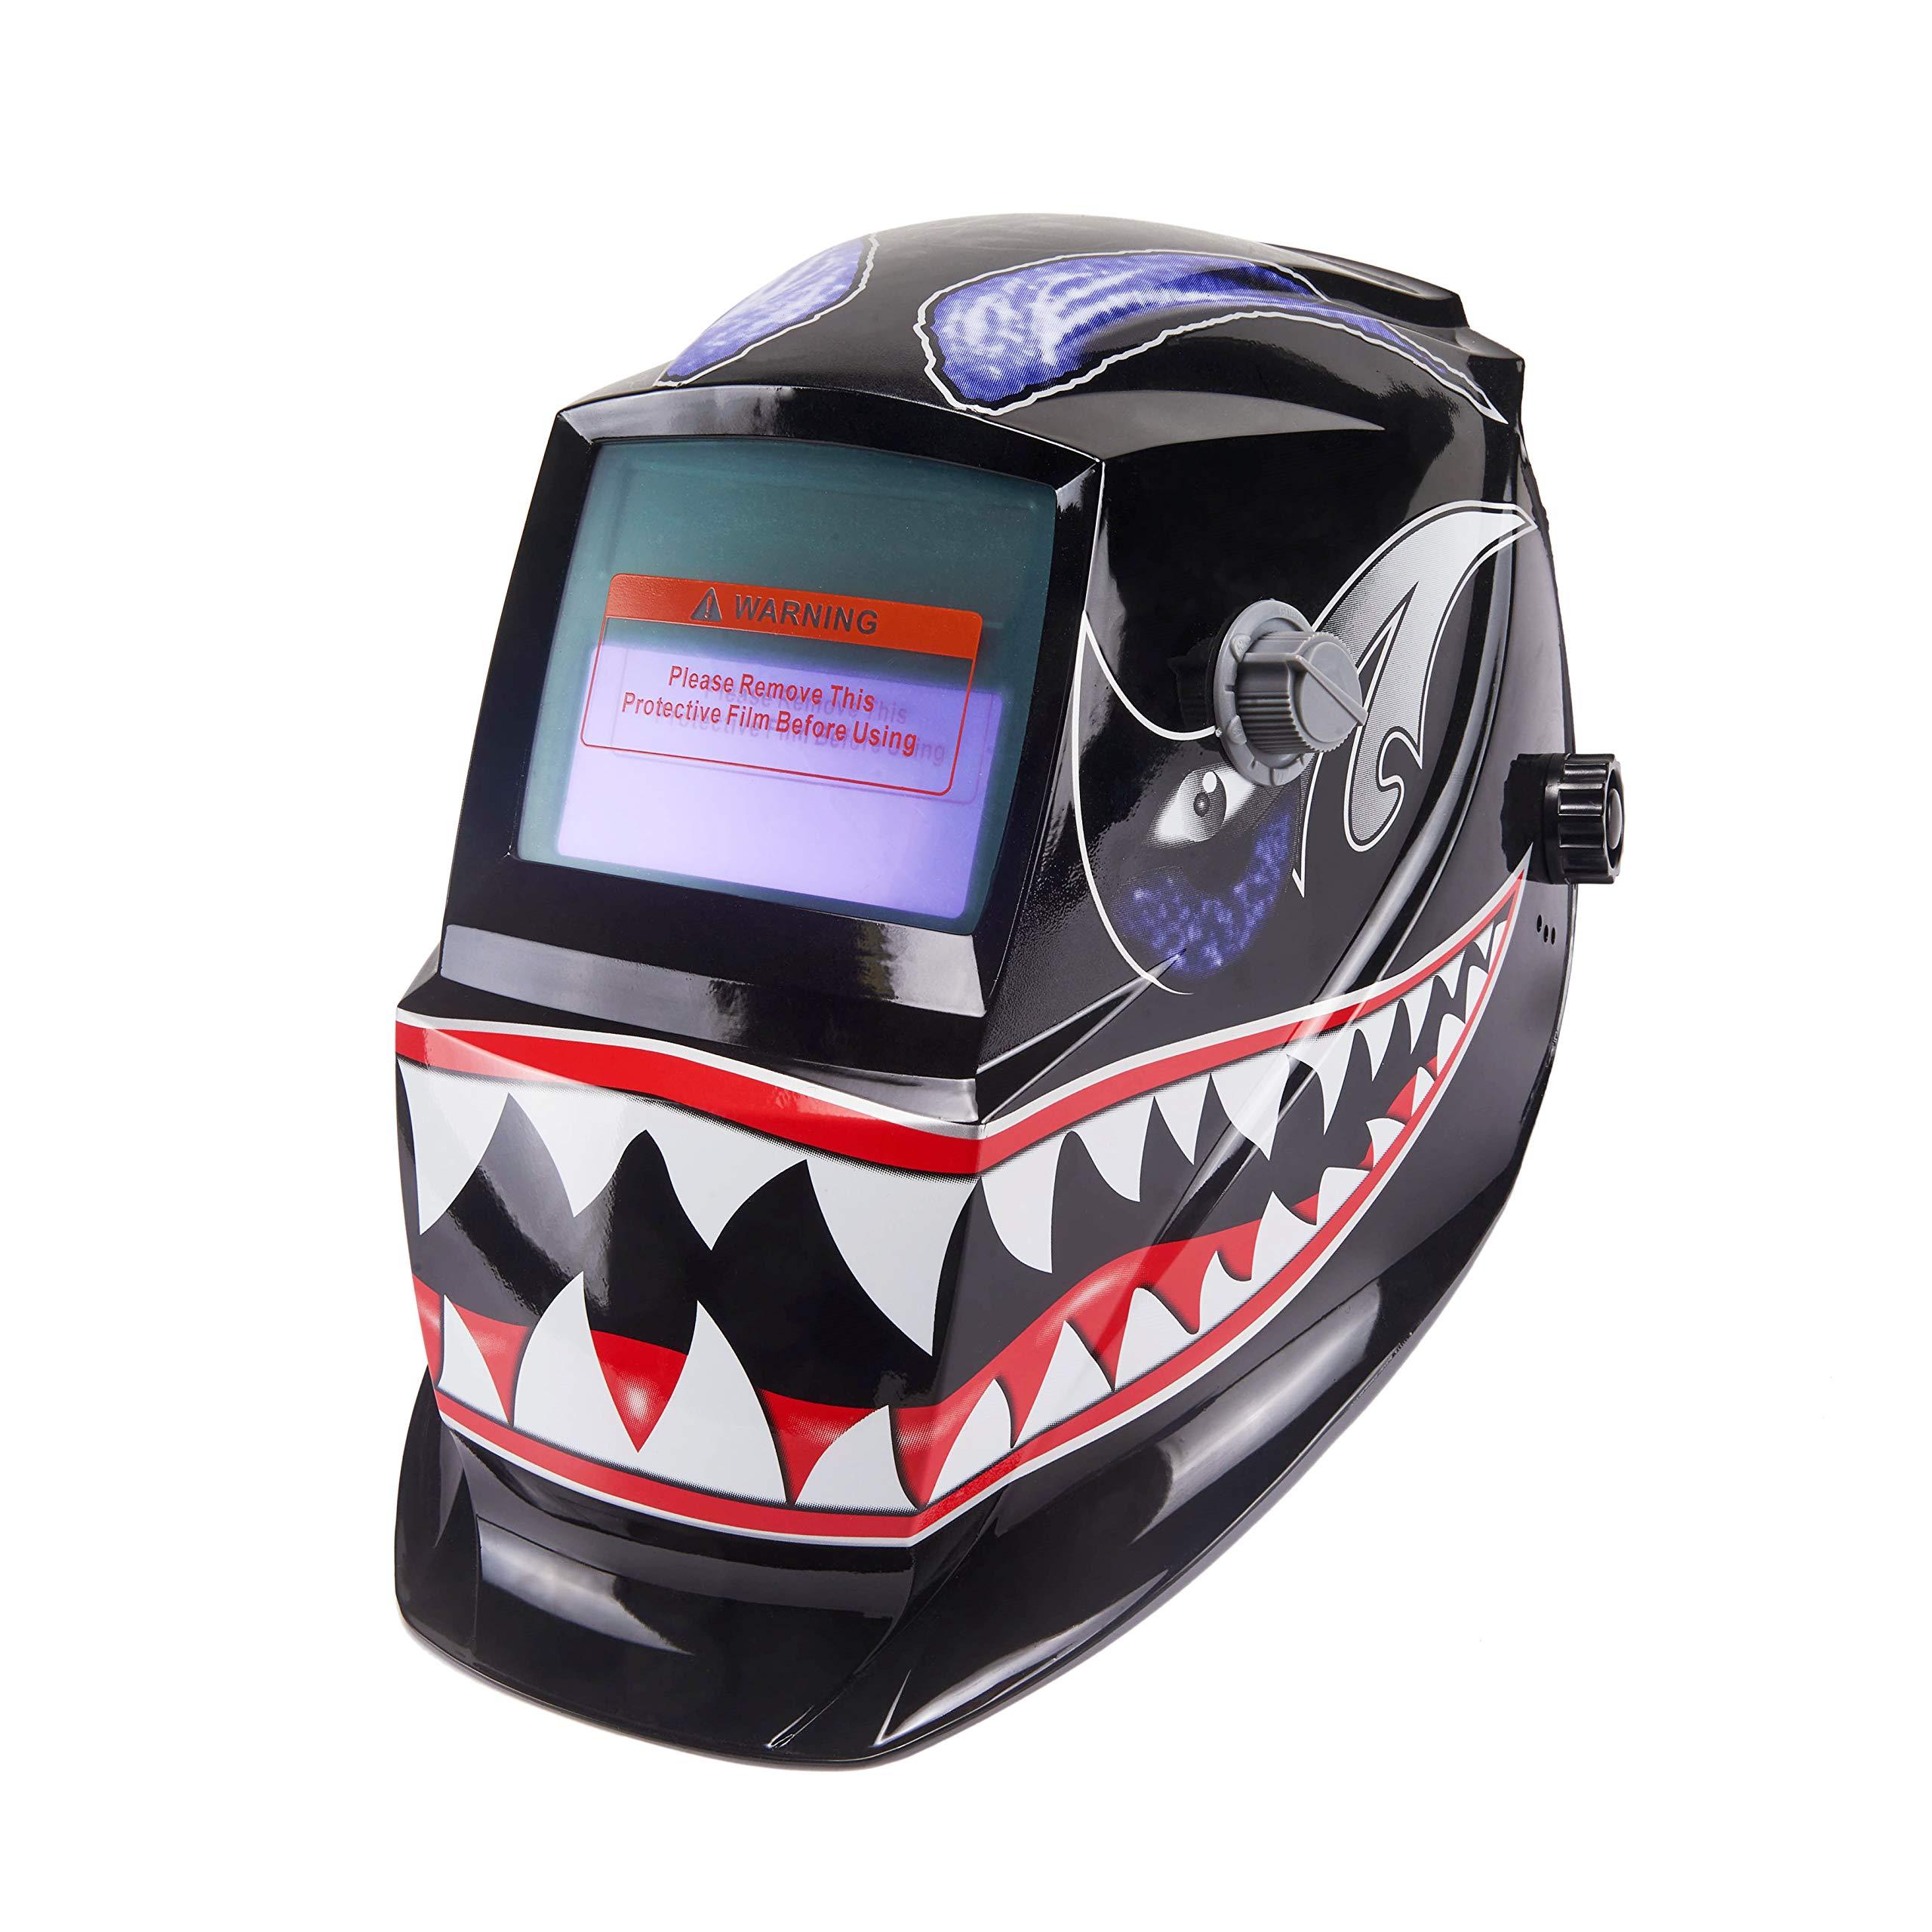 Holulo Solar Power Auto Darkening Welding Helmet Wide Viewing Field Welder Hood for MIG TIG ARC Cap Mask (Shark mouth) by Holulo